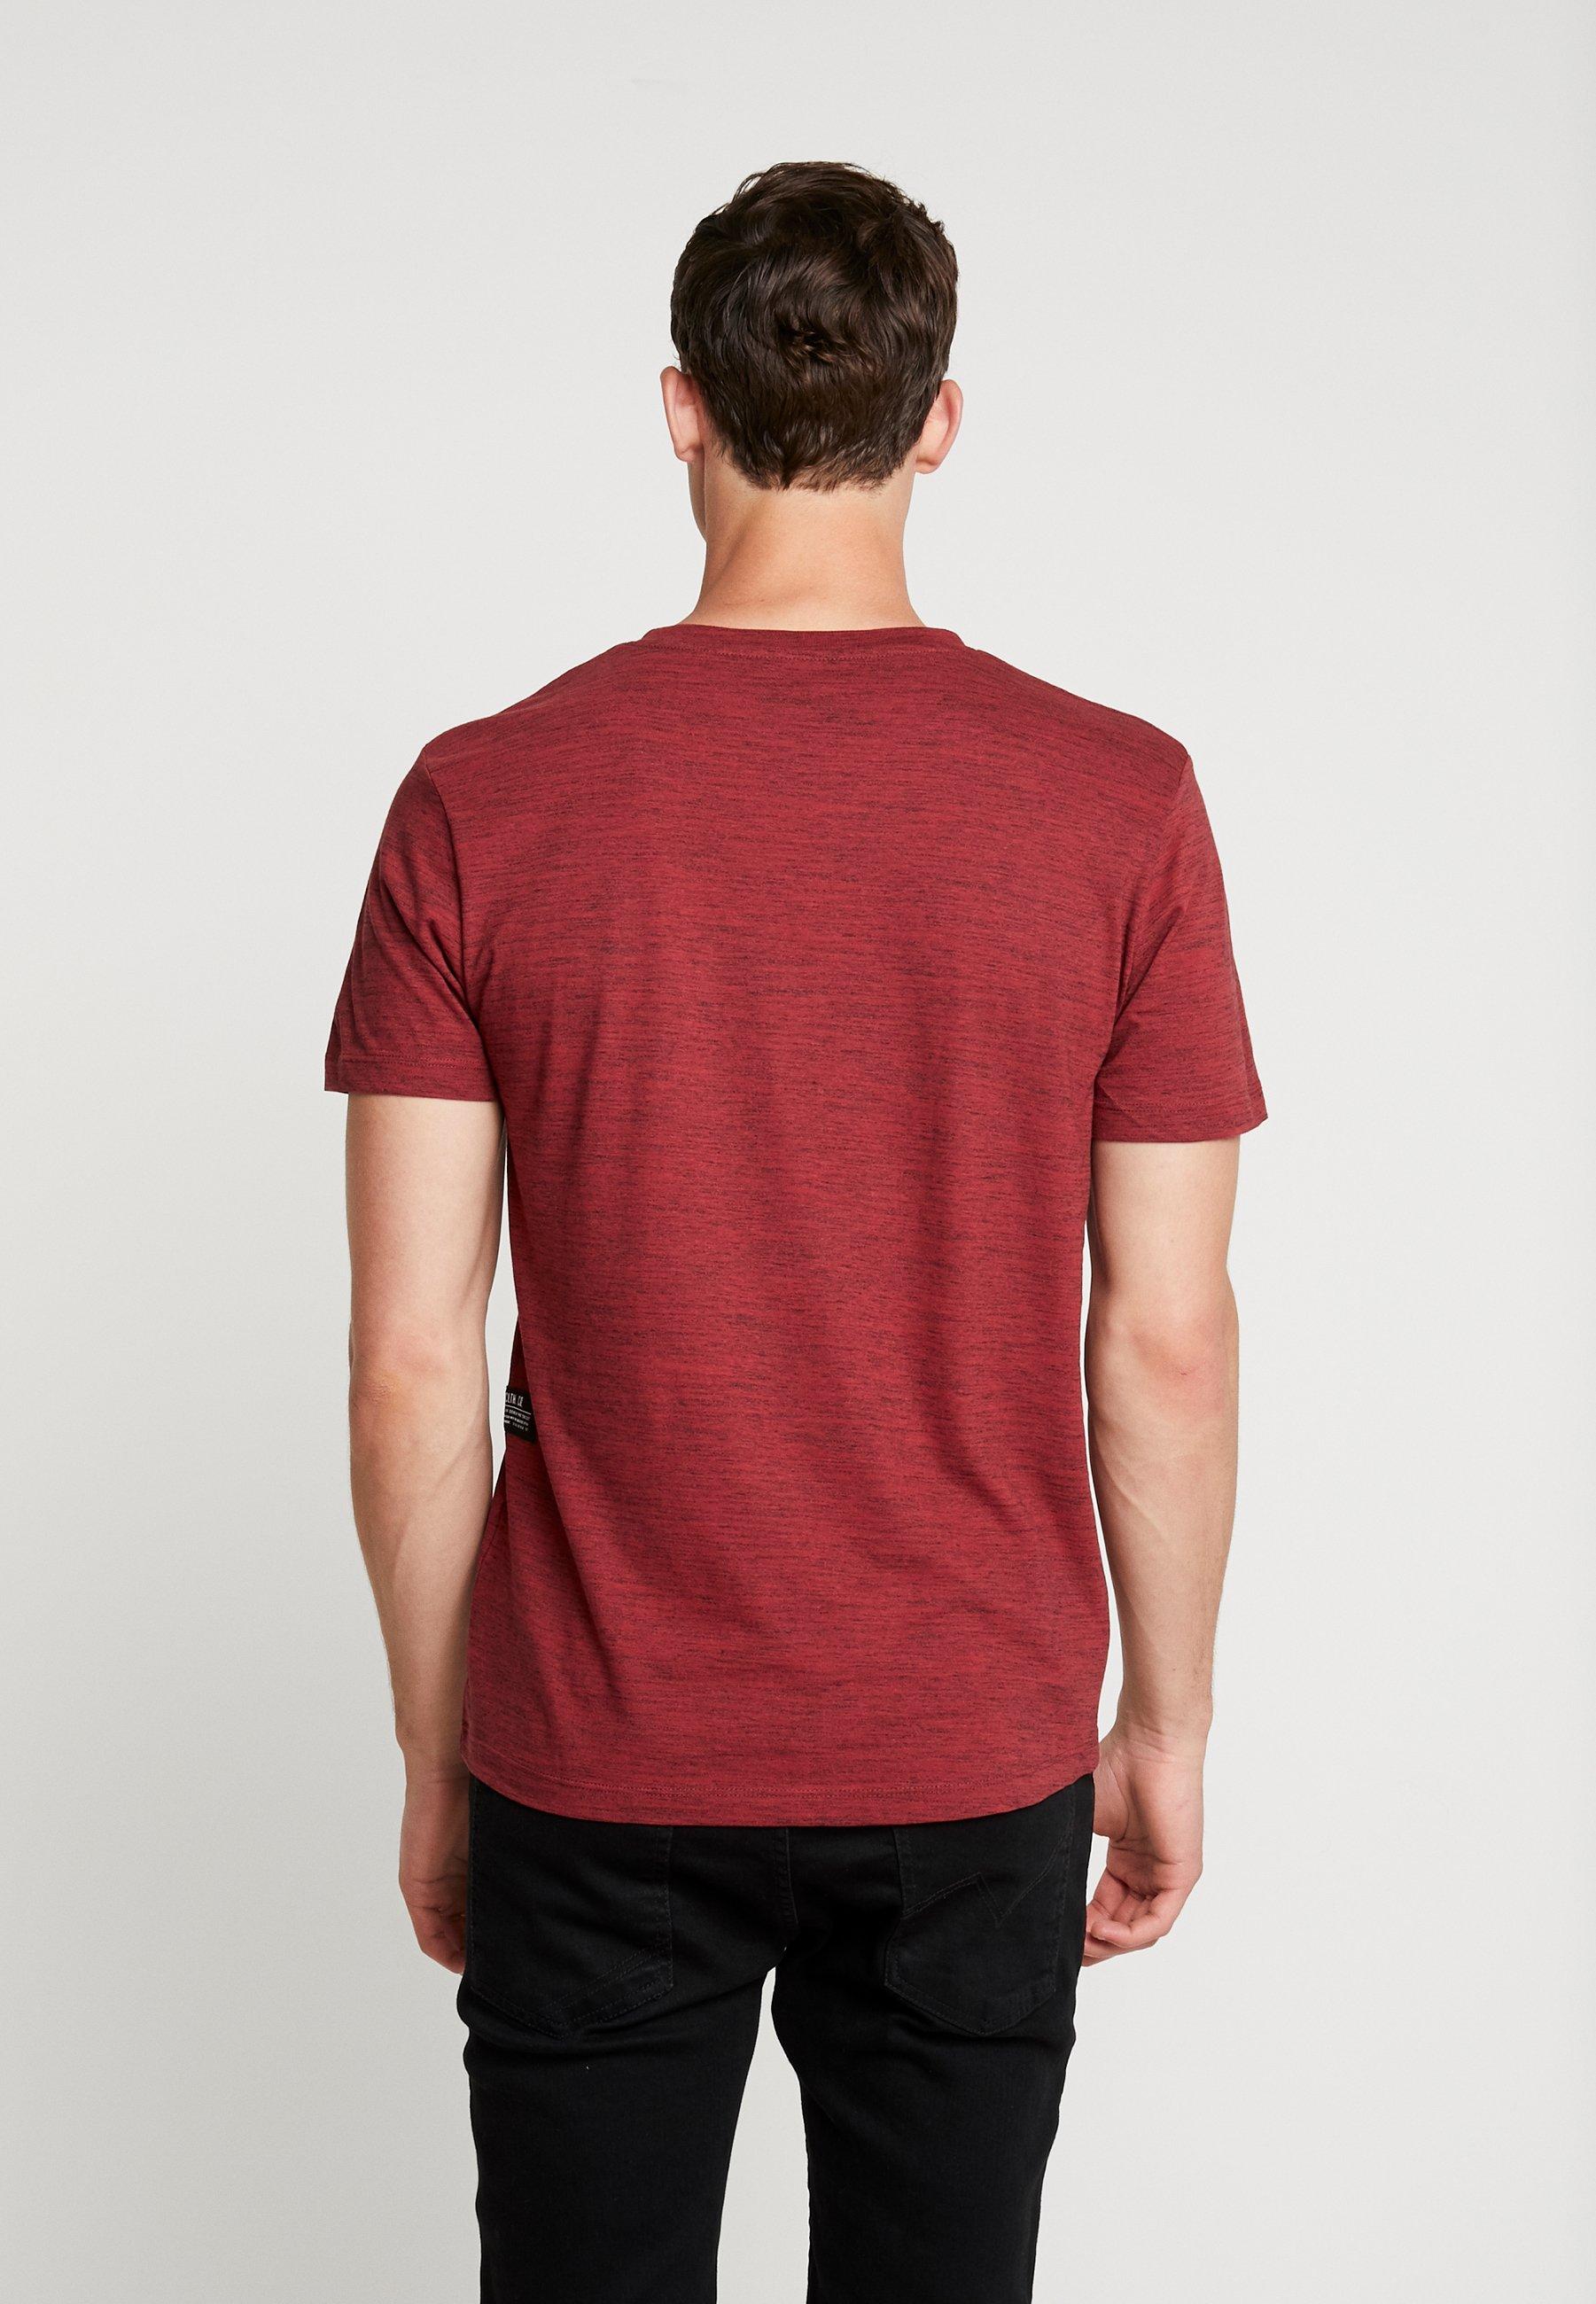 Tom shirt Tailor Red Denim Pipe Basique NosT hrxtCsQd